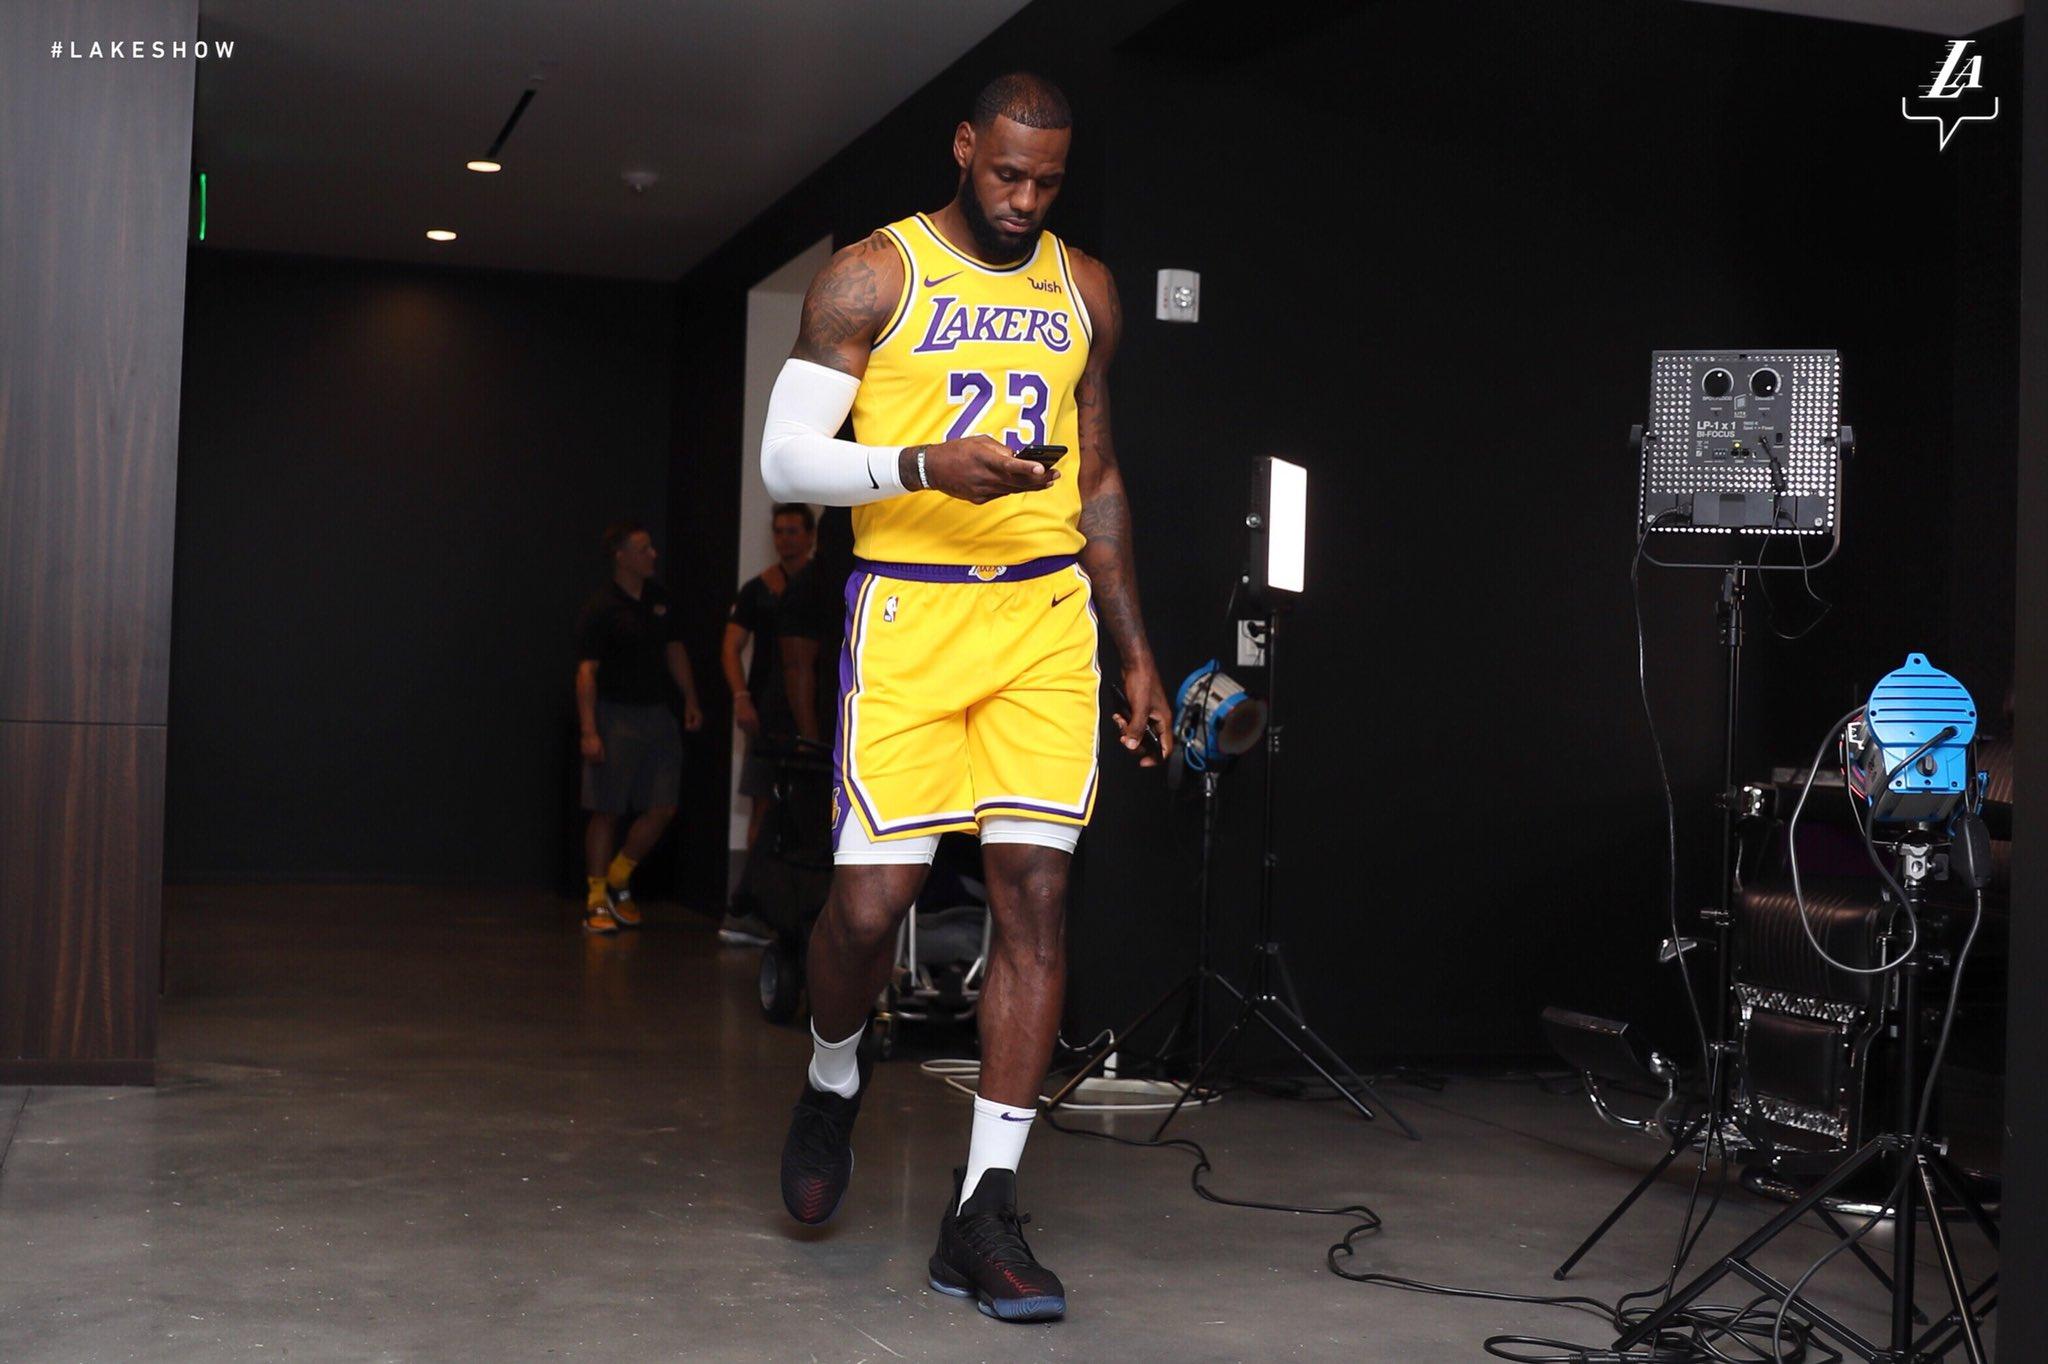 #2️⃣3️⃣ LeBron James Los Angeles Lakers https://t.co/LydrQ58eP1